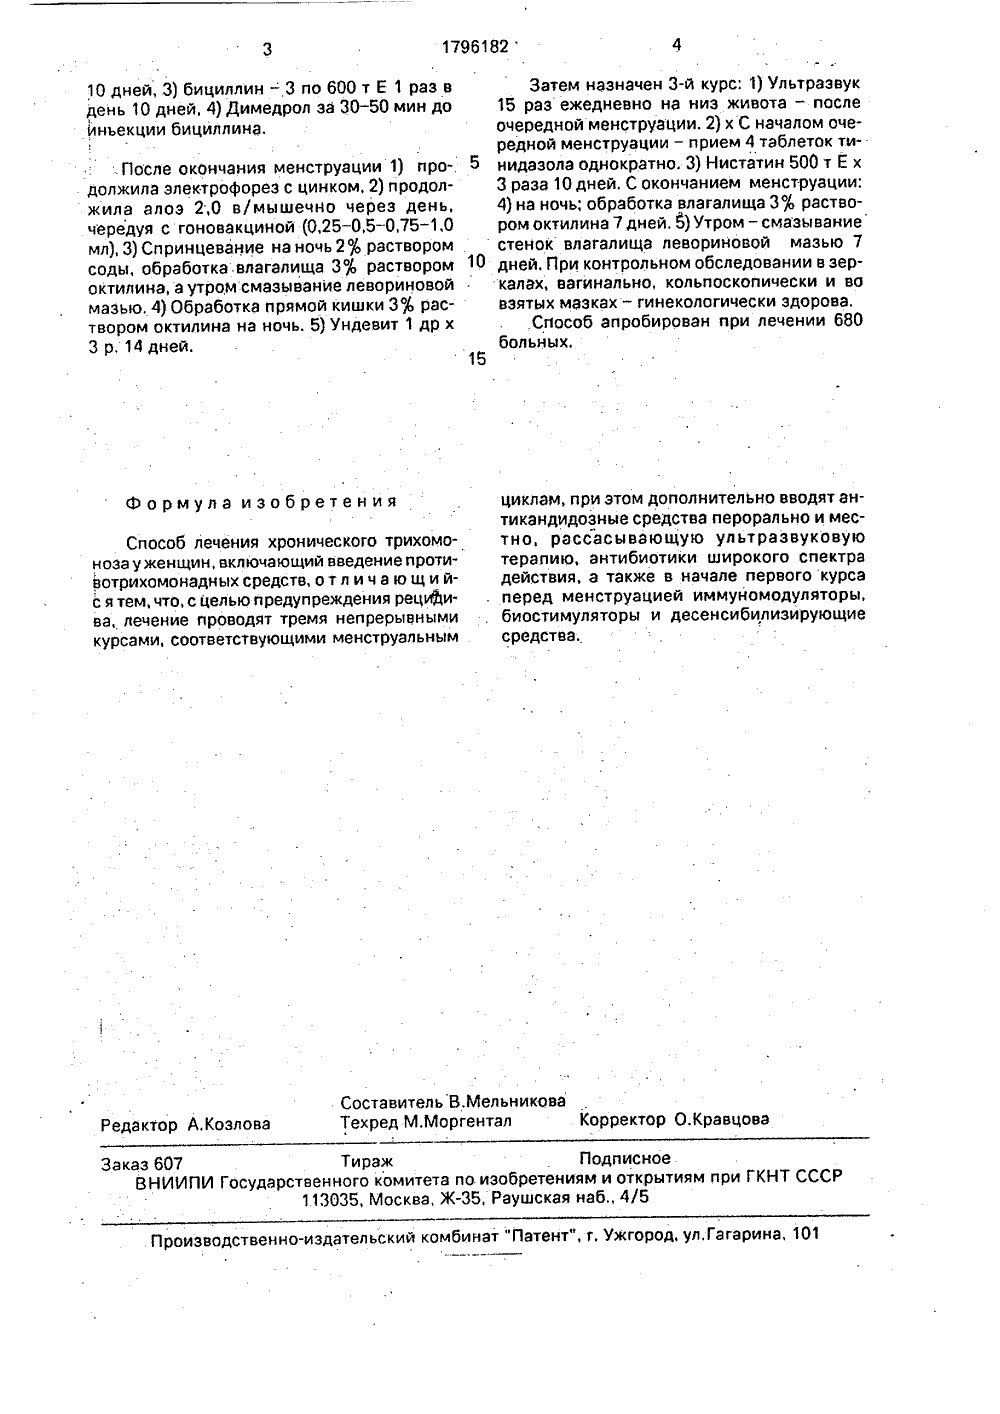 Схема лечения хронич трихомоноза фото 897